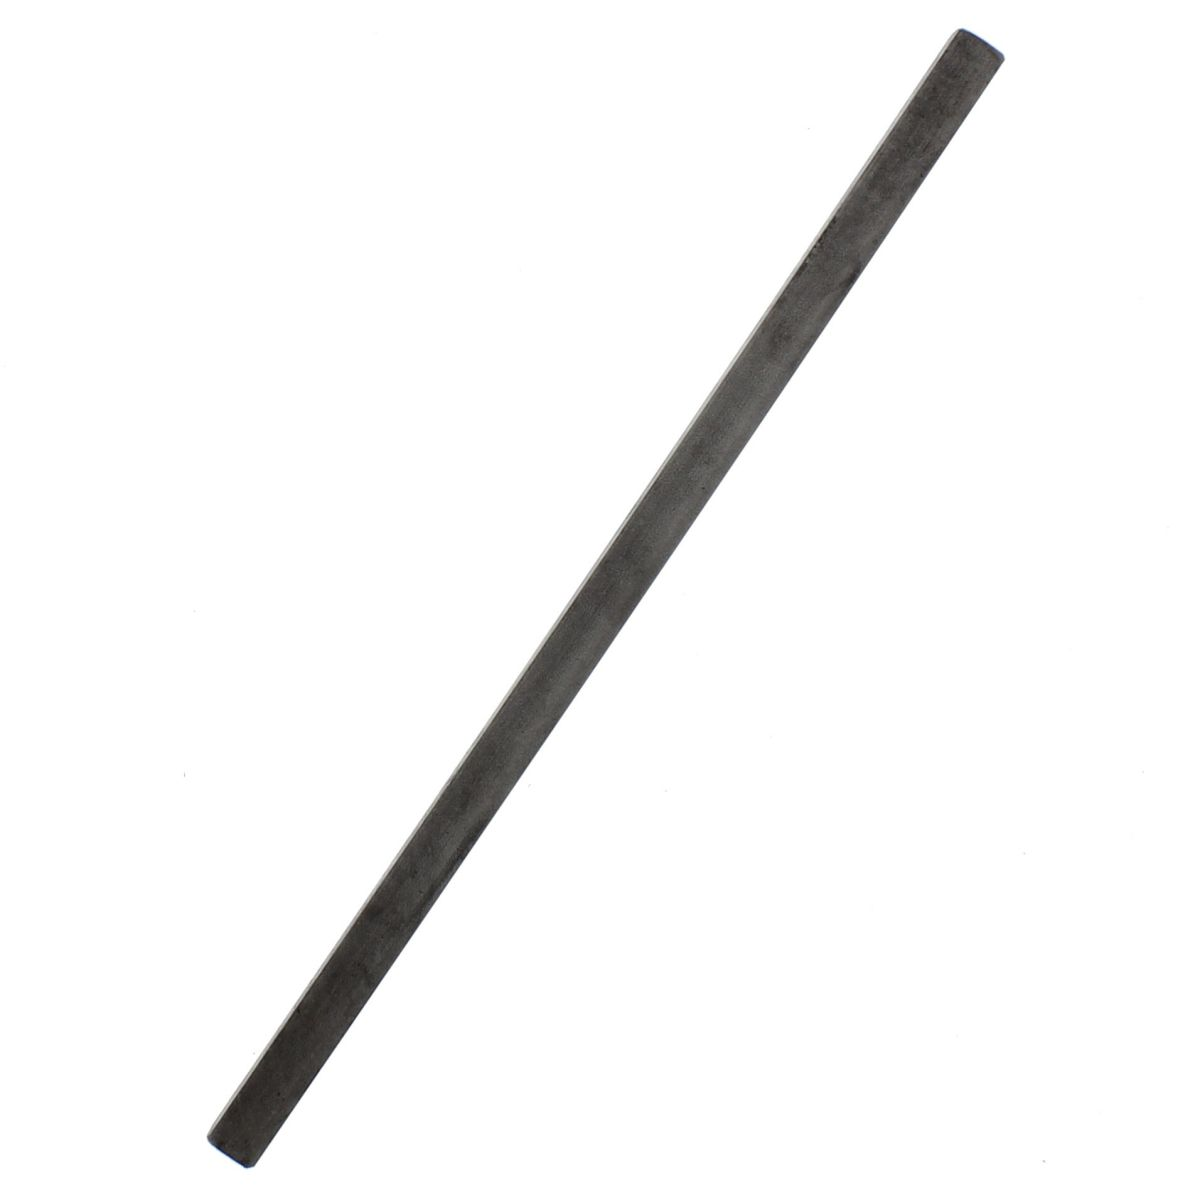 "1"" x 3 ft. Length Square Keystock — 304 Stainless Steel"